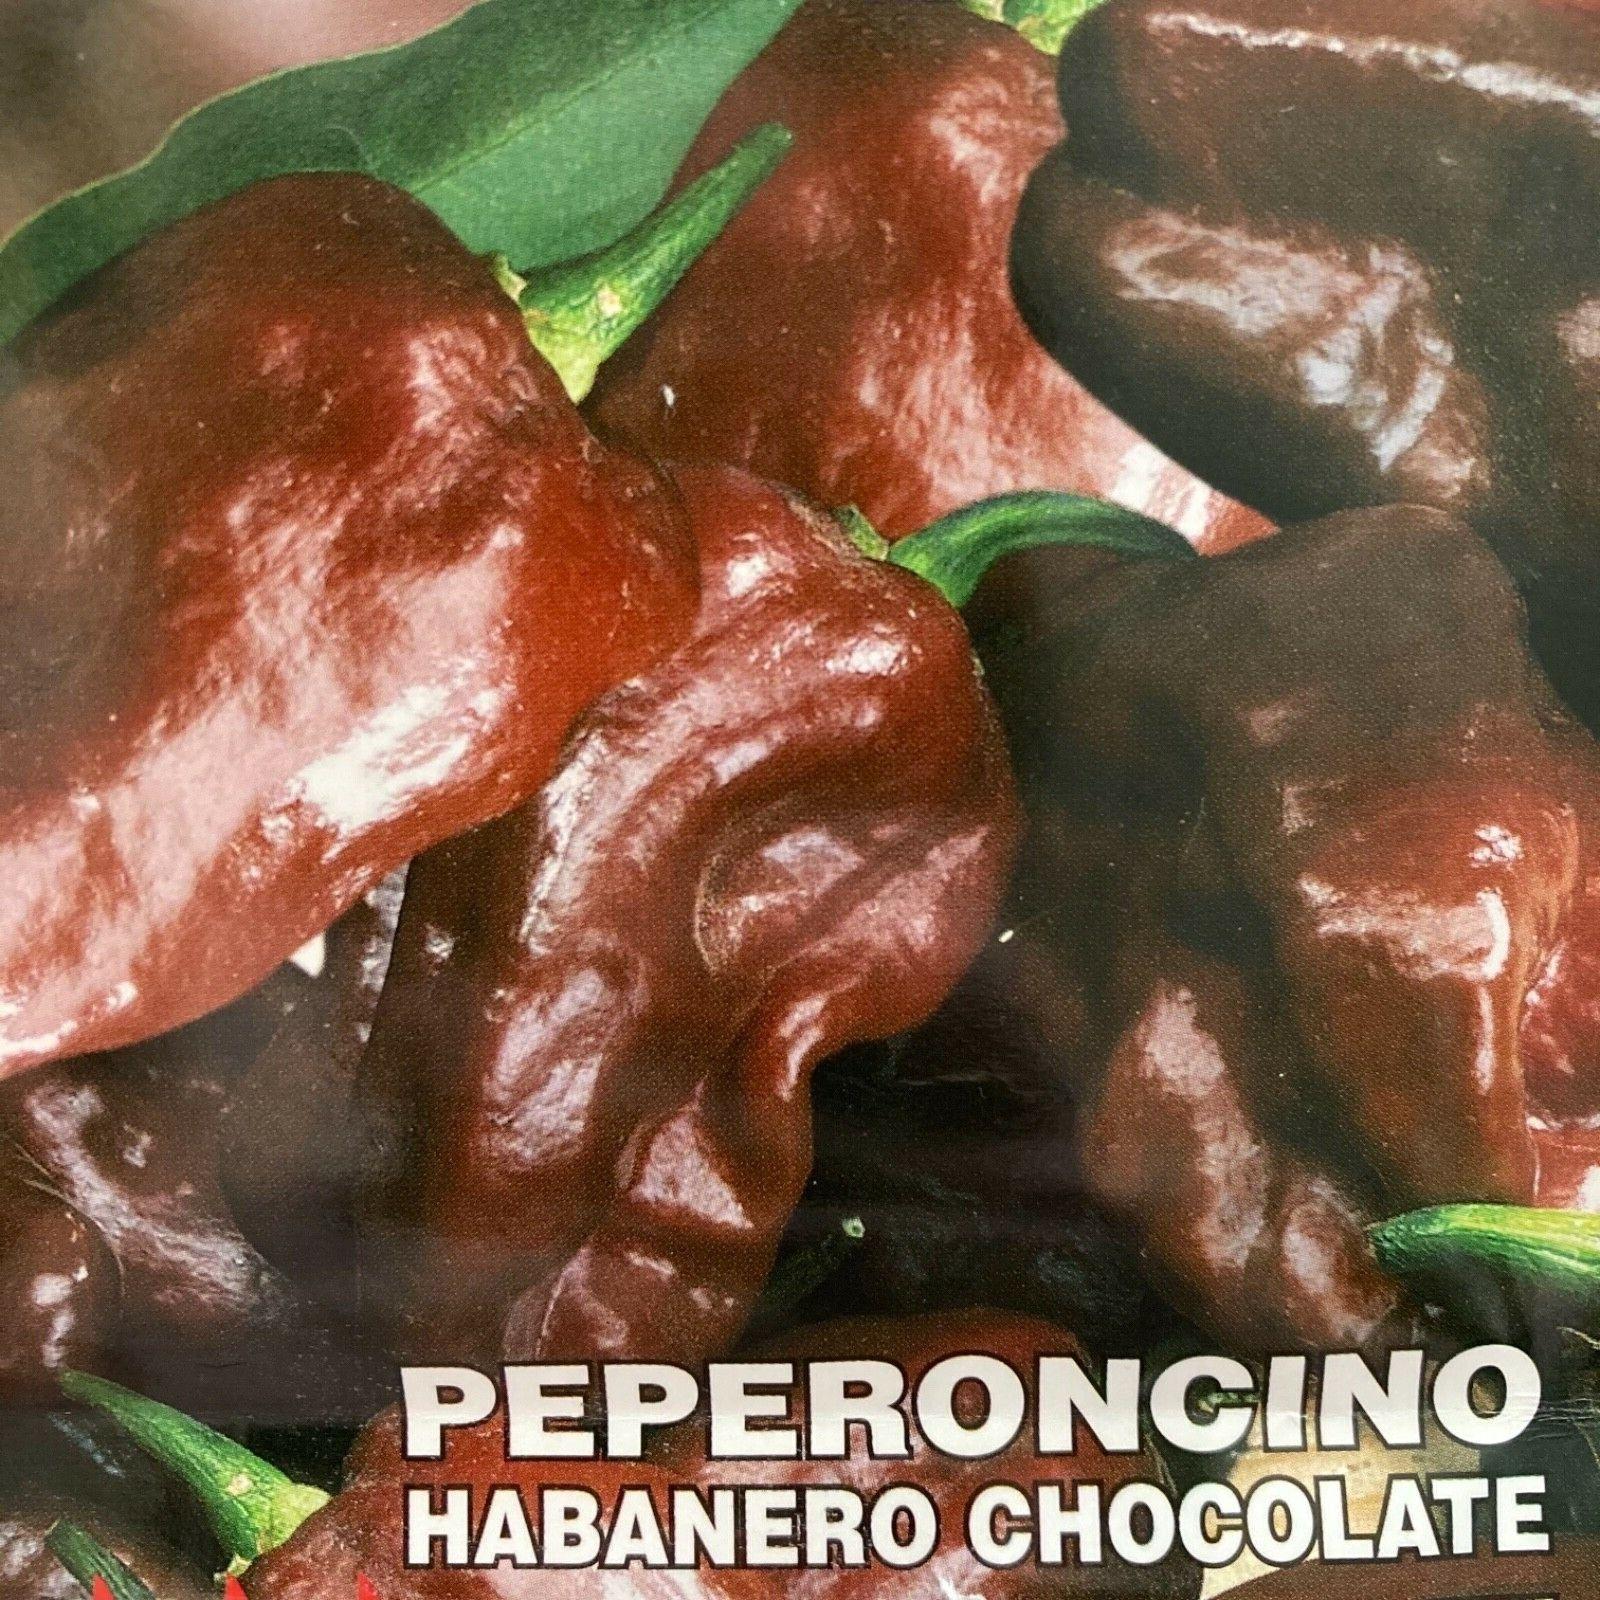 Chocolate Habanero Chilli Seeds x6 - Congo Black pepper chili chillies